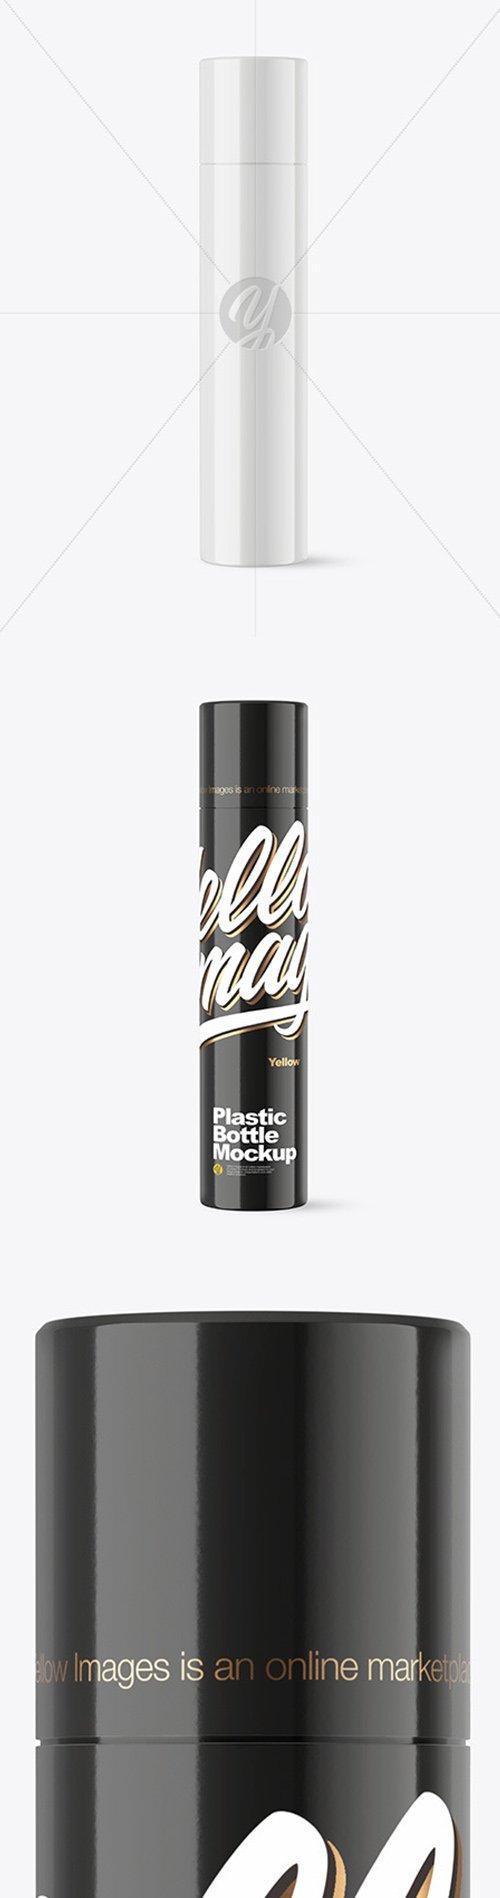 Glossy Cosmetic Spray Bottle Mockup 53465